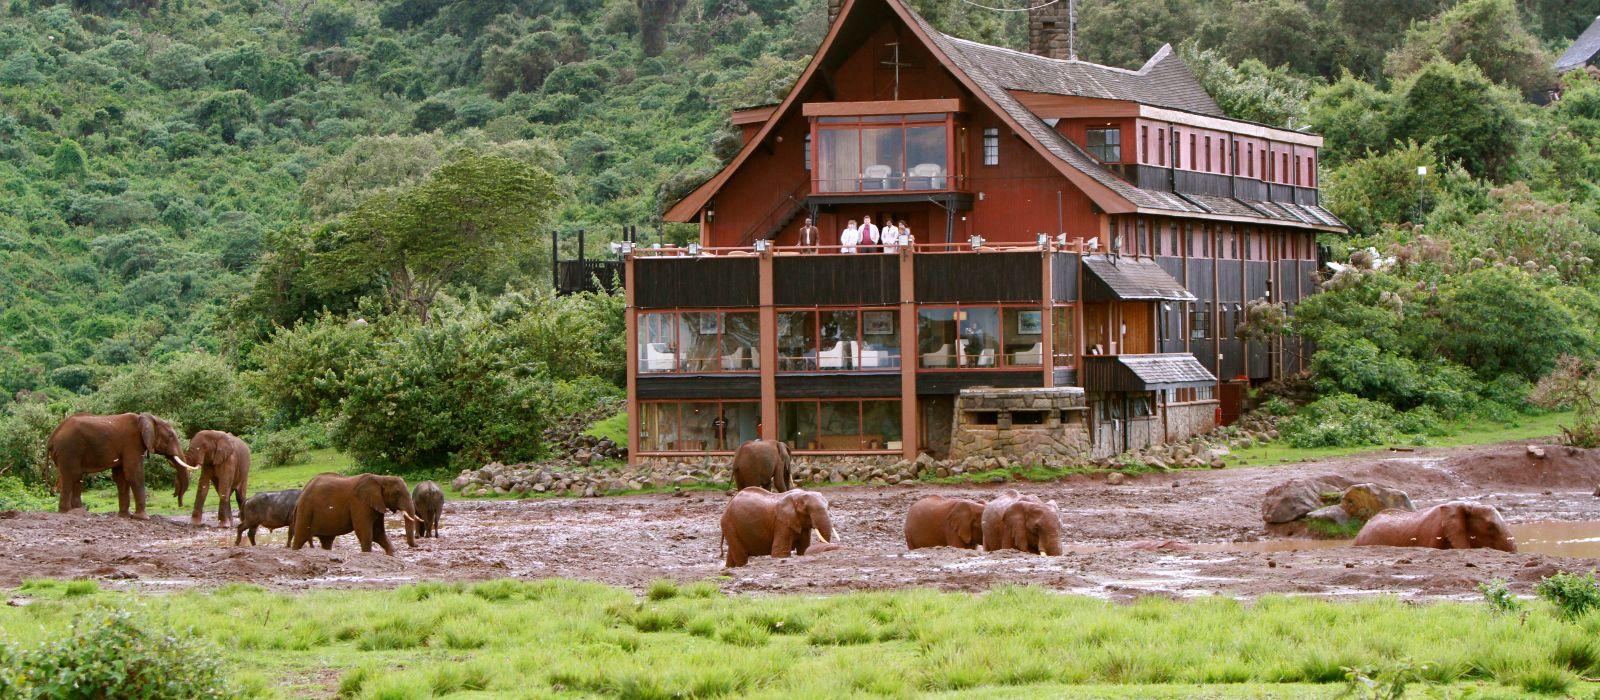 Hotel The Ark Kenia